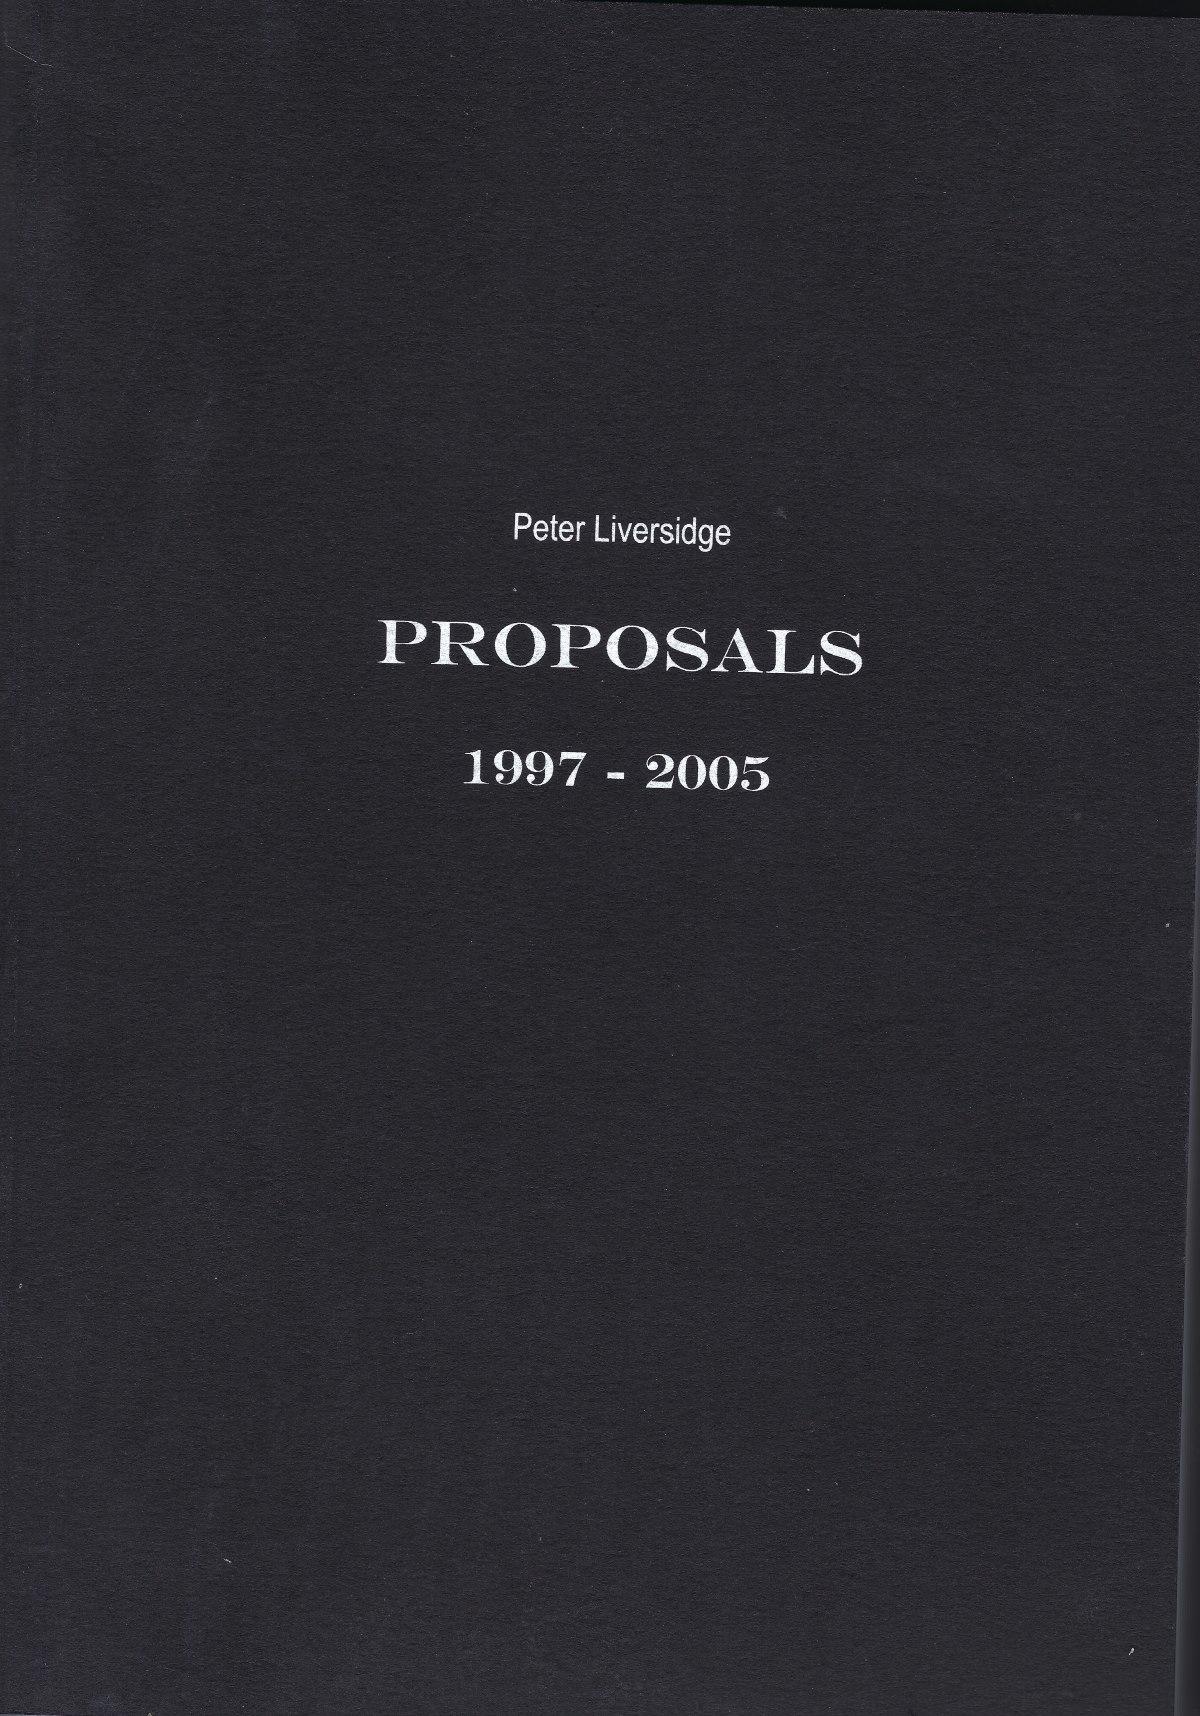 Peter Liversidge: Selected Proposals, 1997-2005